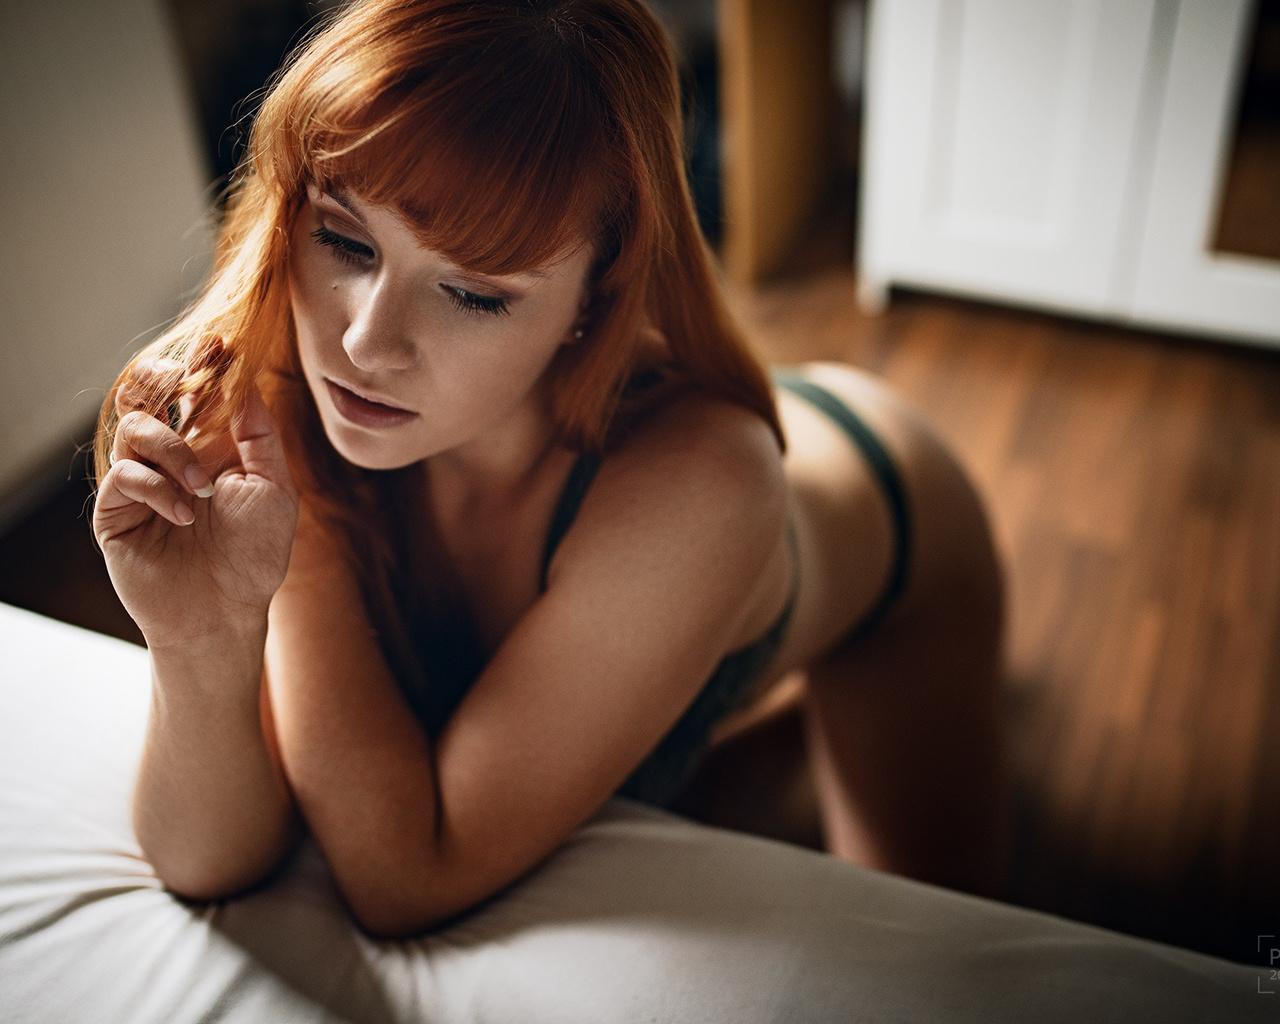 nude girl blow job gif